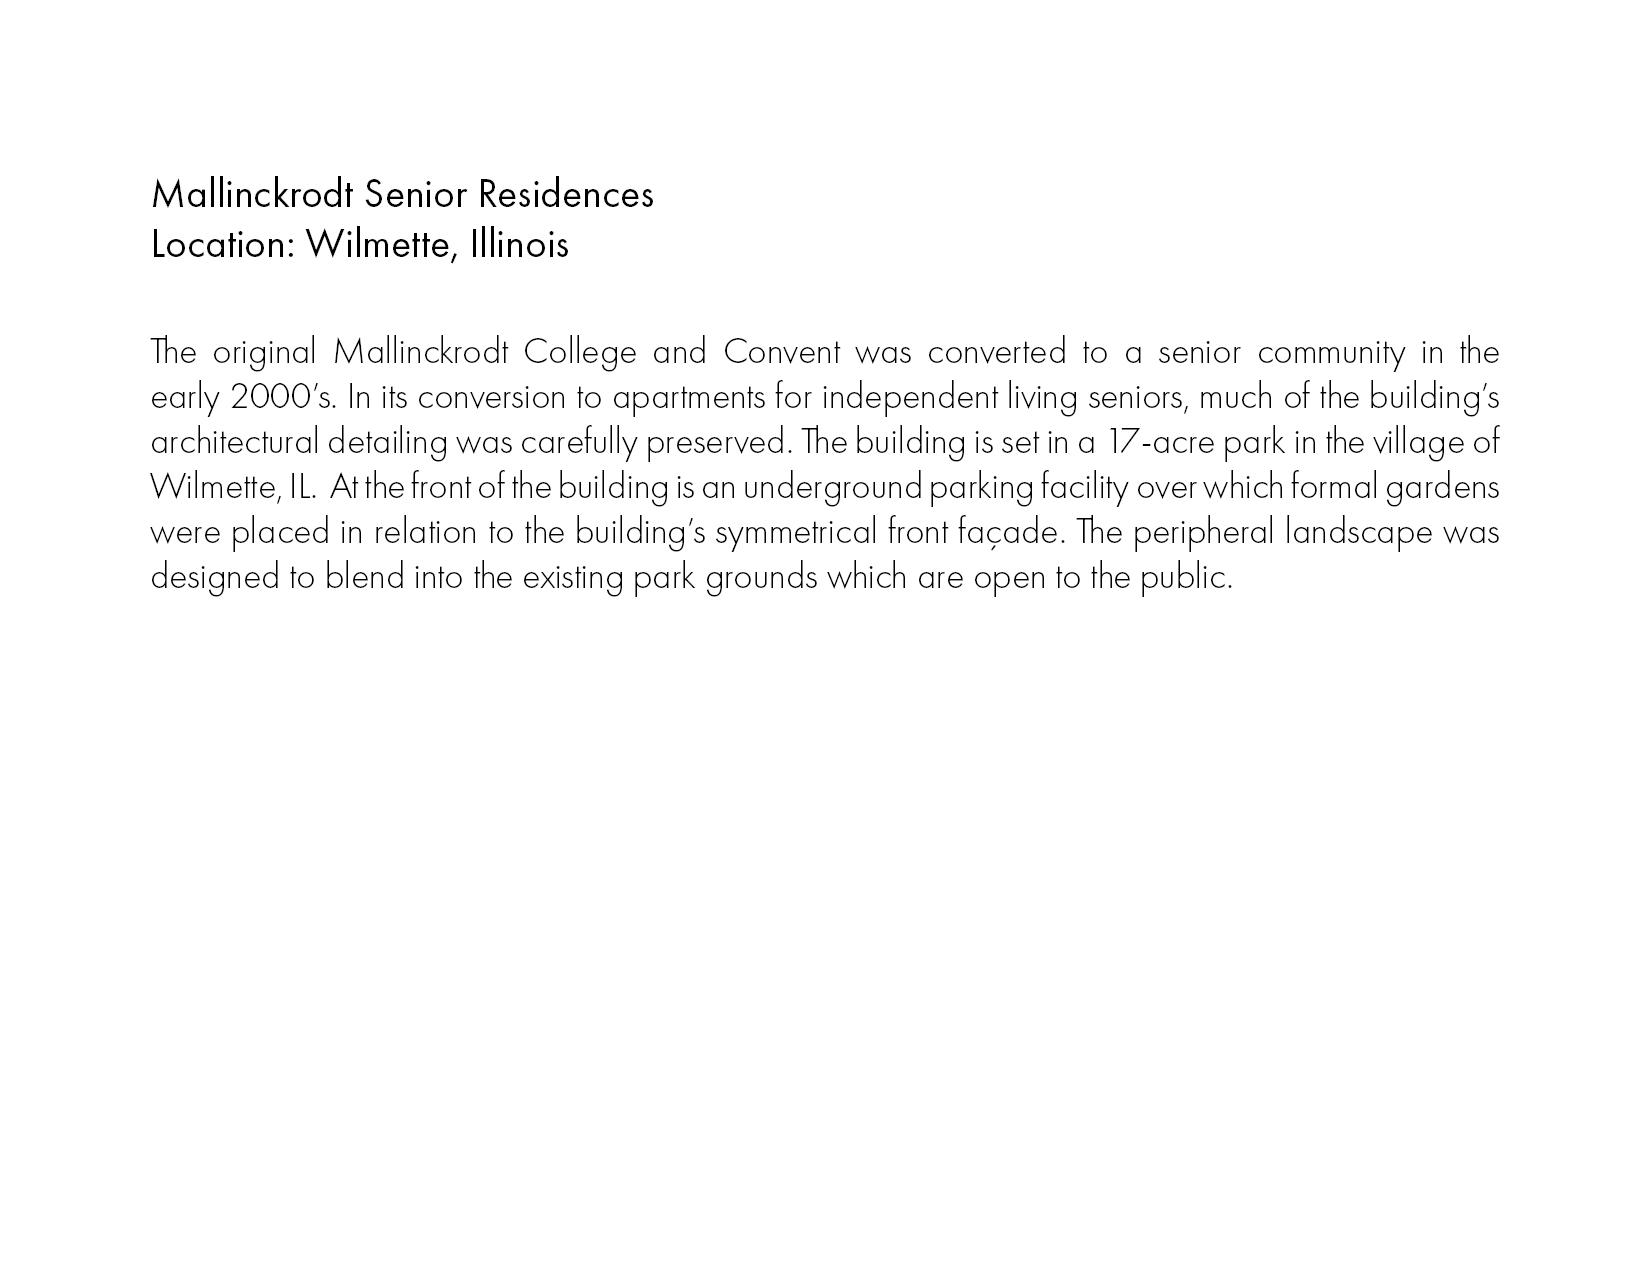 Mallinckrodt Senior Living — Daniel Weinbach & Partners ltd